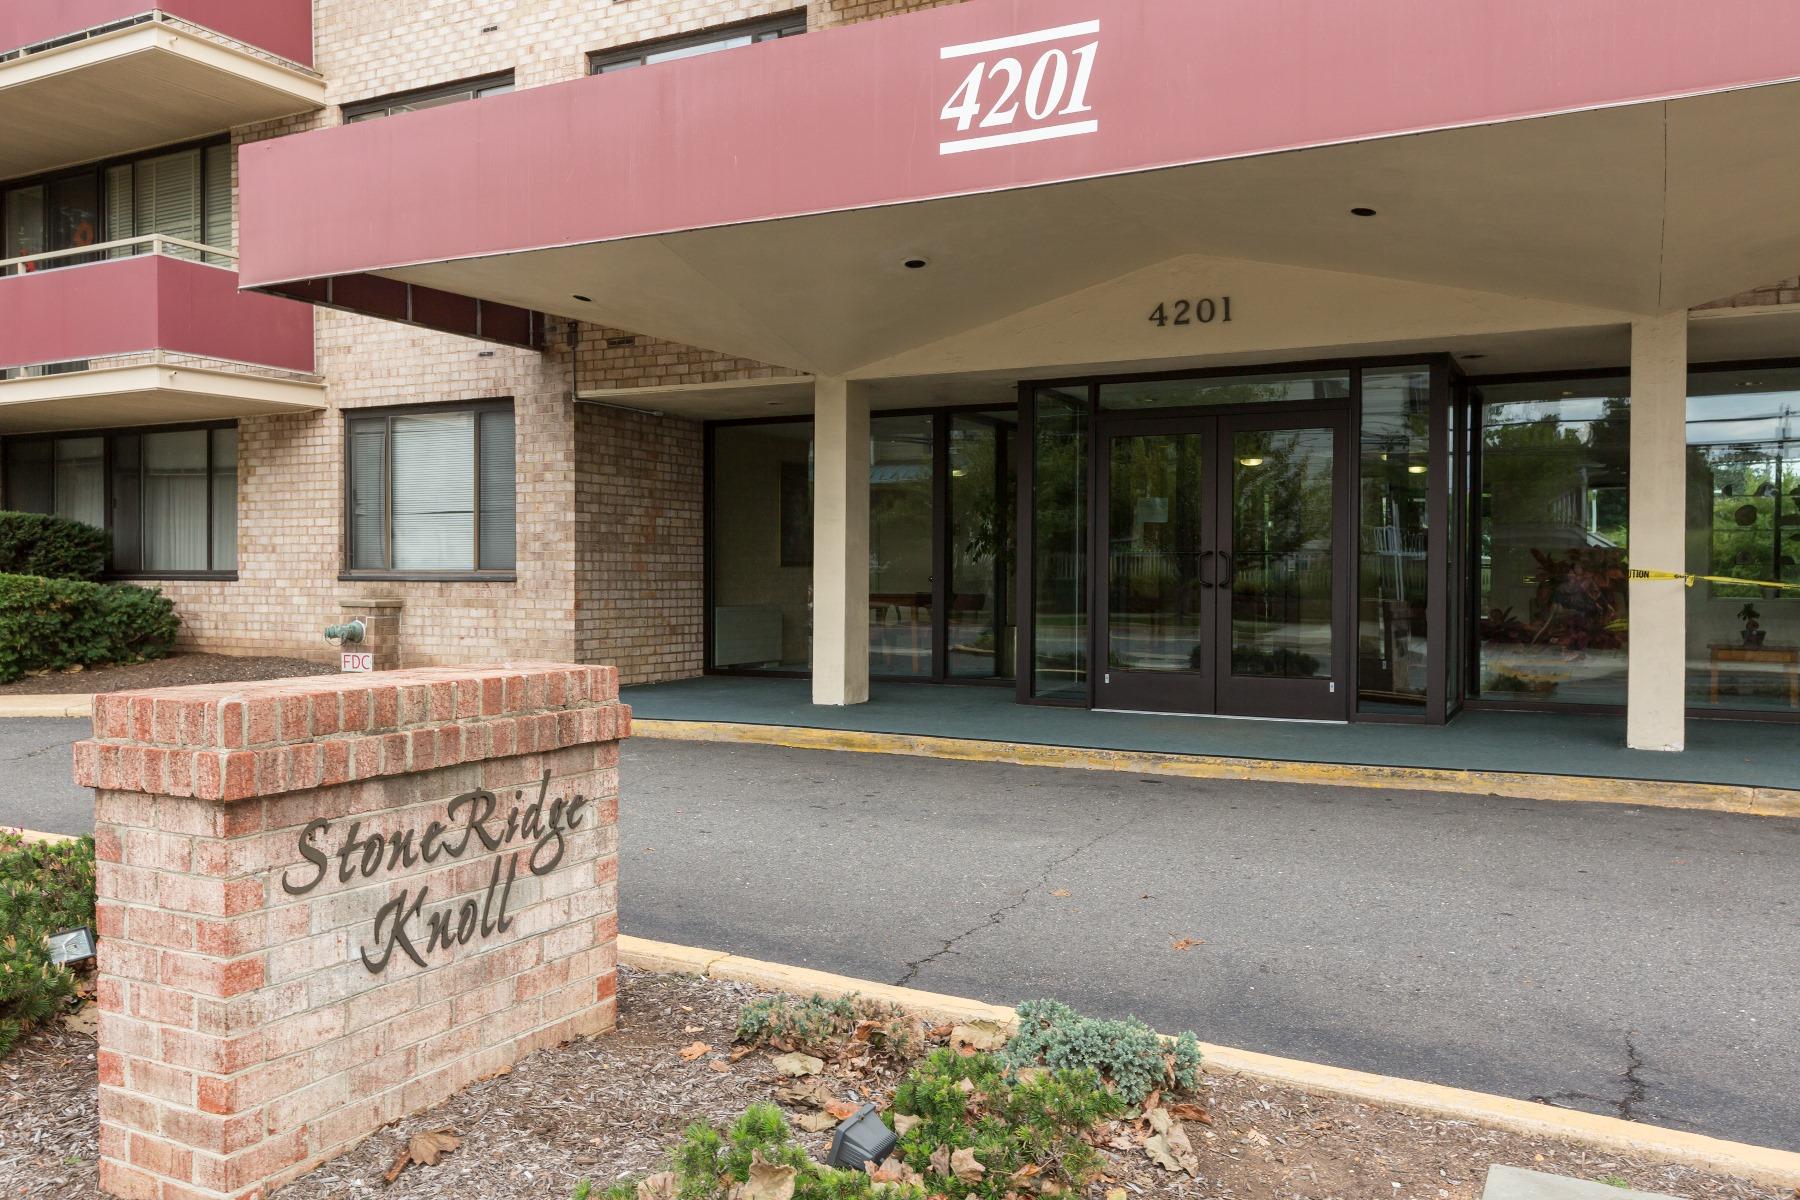 Condominium for Sale at 4201 Lee 809, Arlington 4201 Lee Hwy 809 Arlington, Virginia 22207 United States